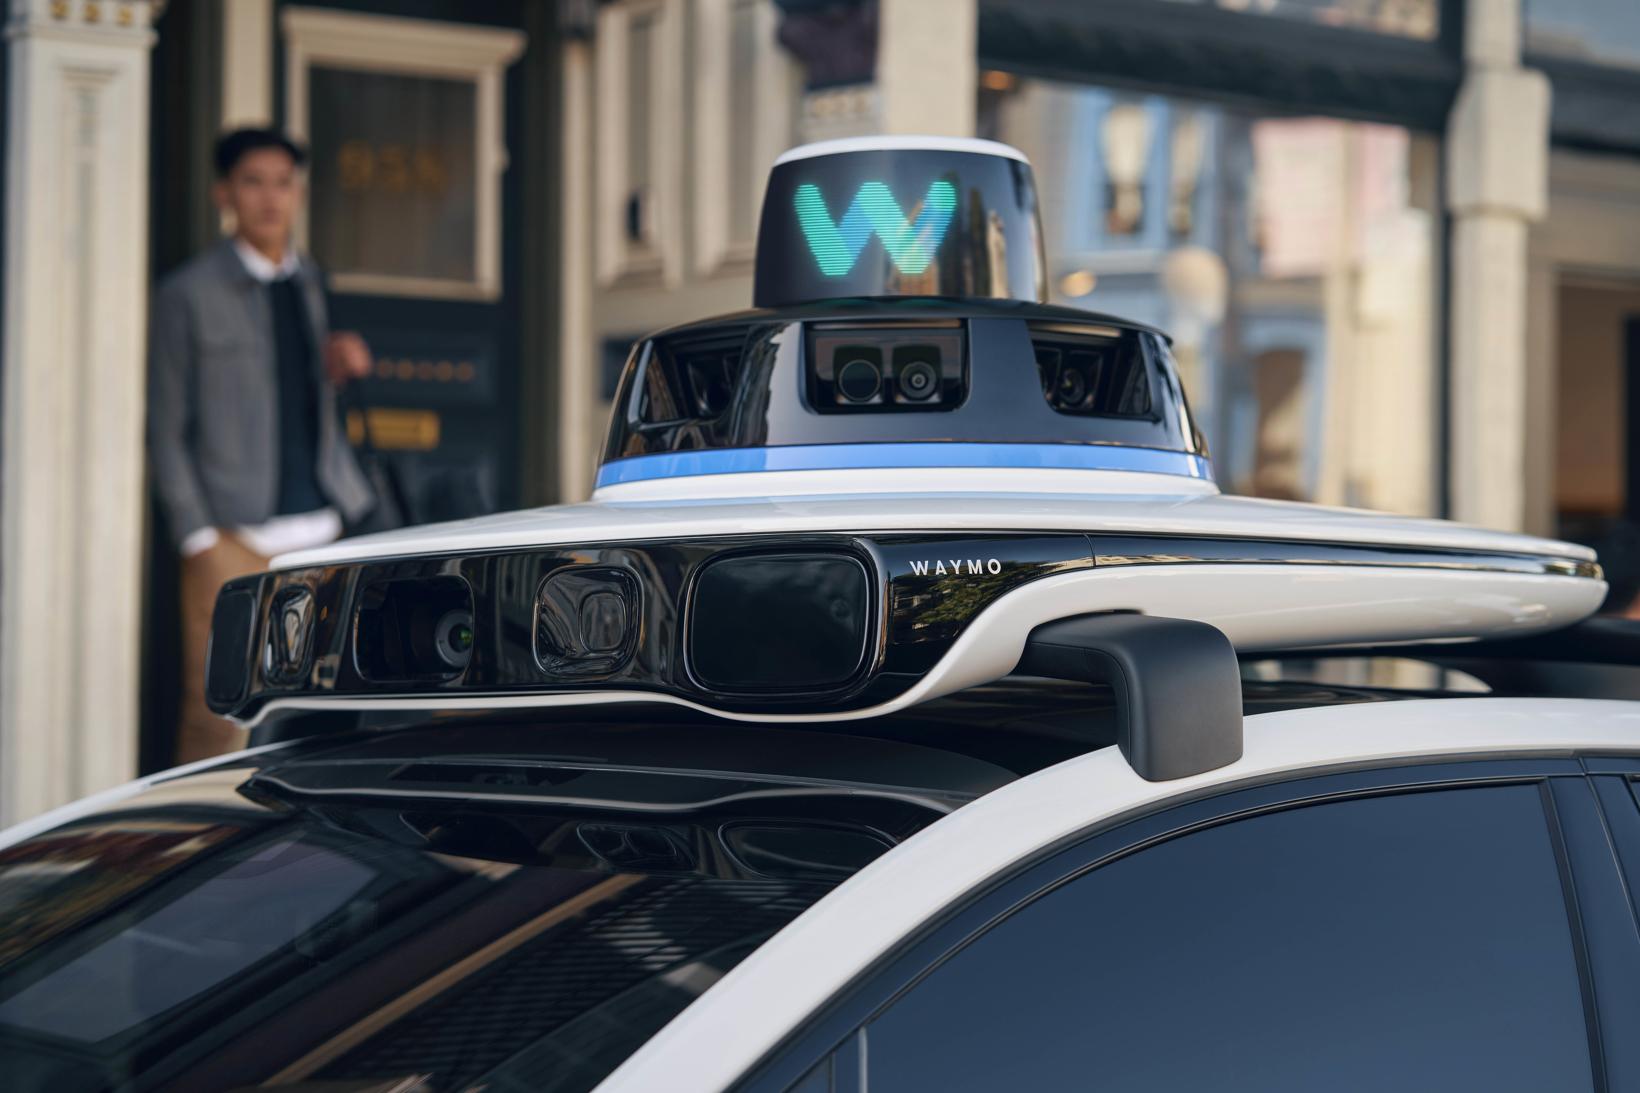 Waymo停止销售激光雷达传感器